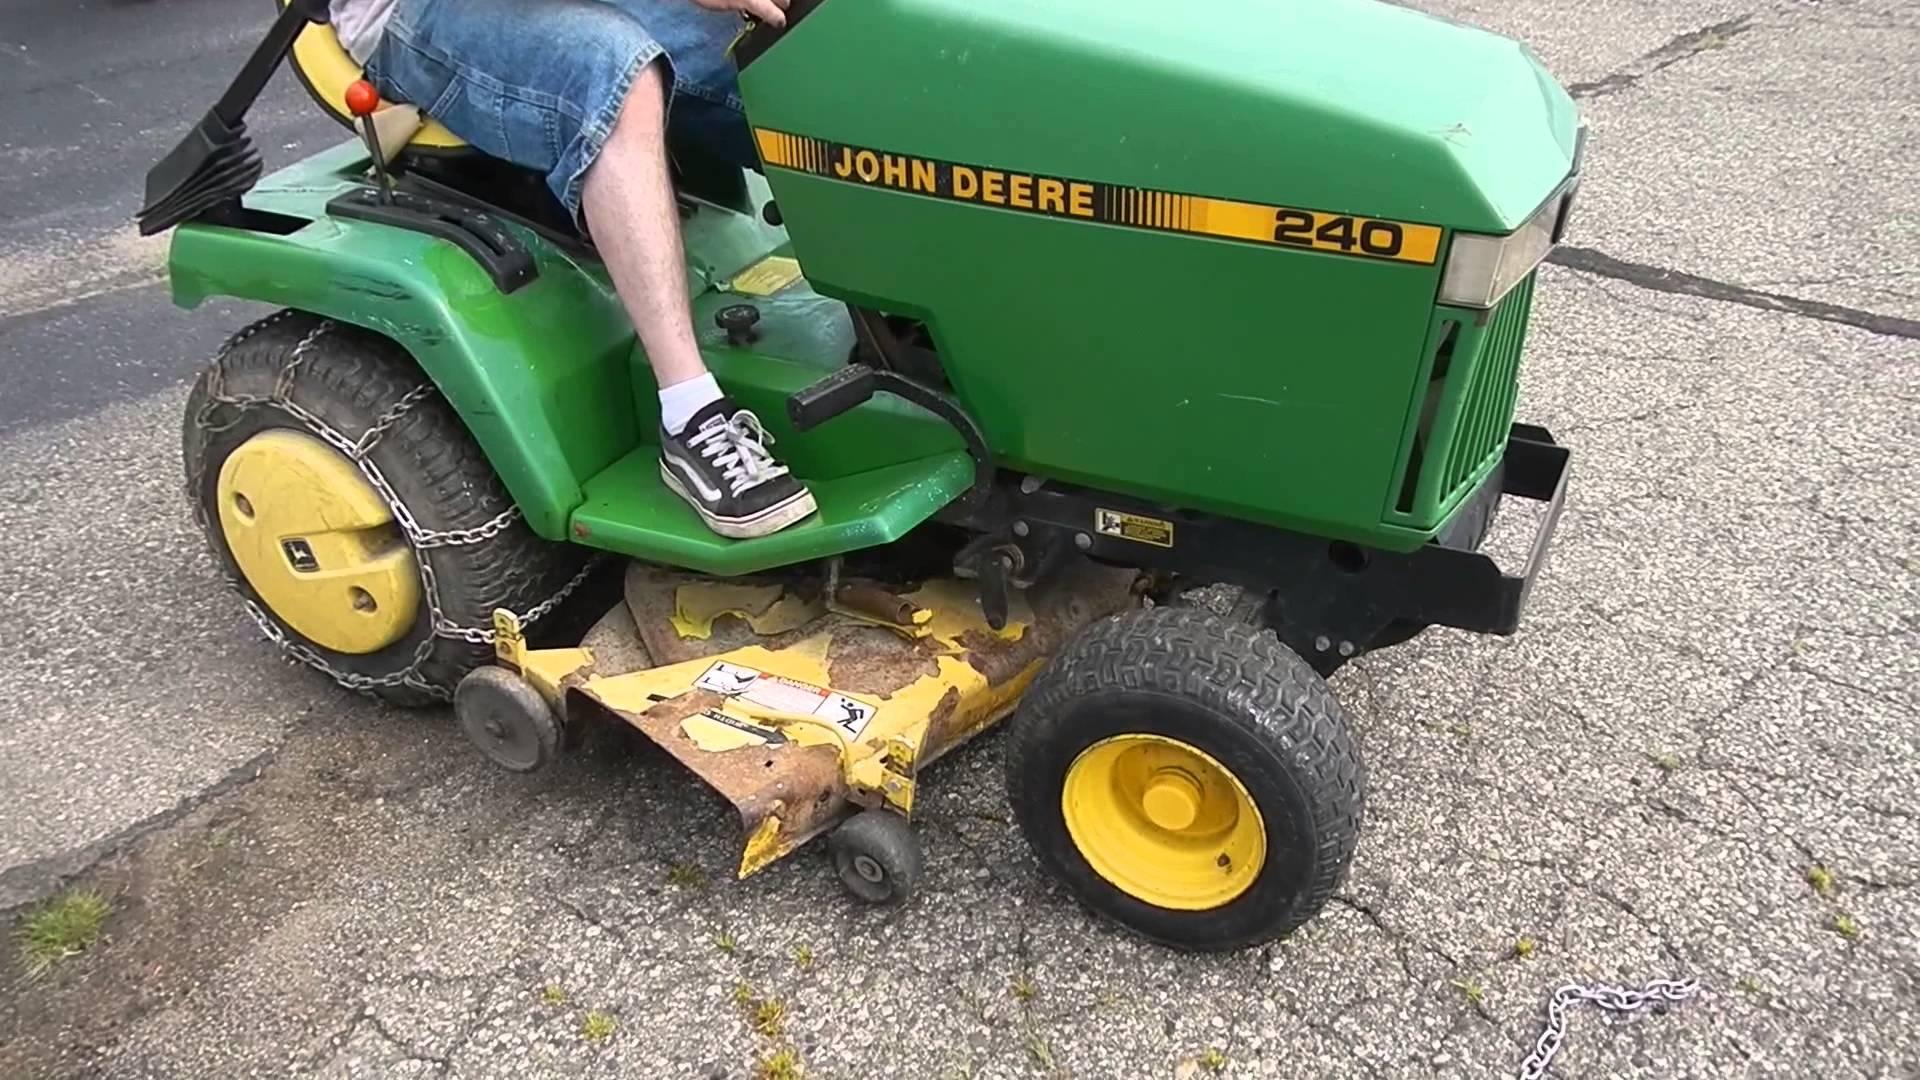 hight resolution of john deere replacement part lawn mower model 240 engine